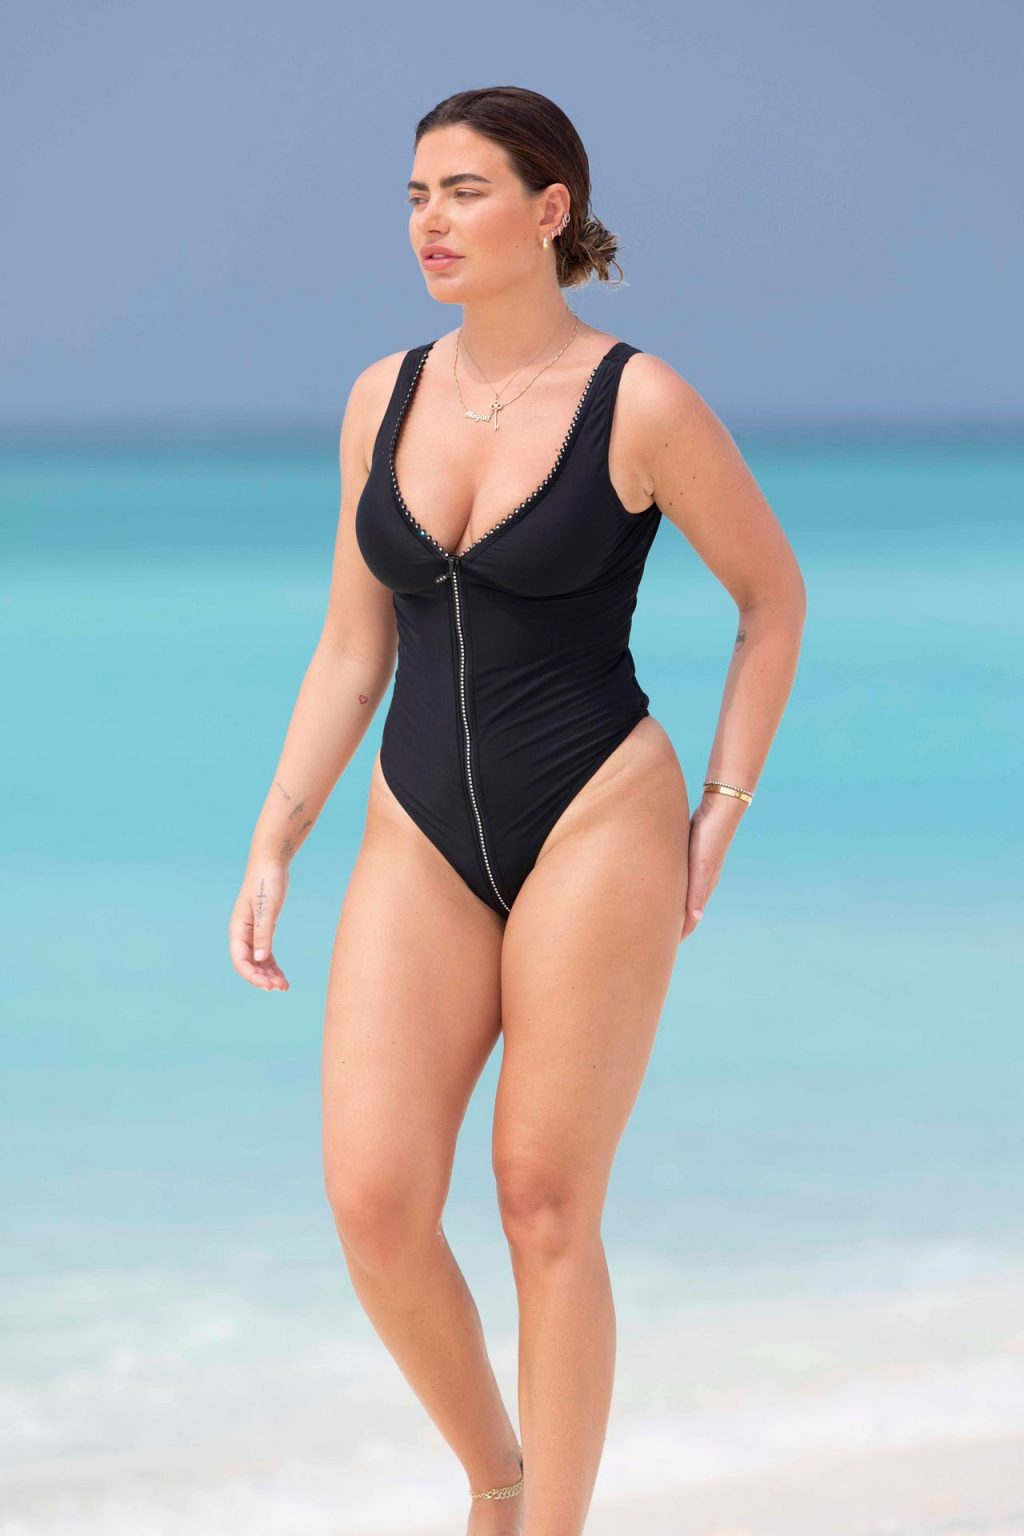 Megan Barton Hanson Sexy The Fappening Blog 12 1024x1536 - Megan Barton-Hanson Seen Enjoying Her Holiday in the Maldives (22 Photos)